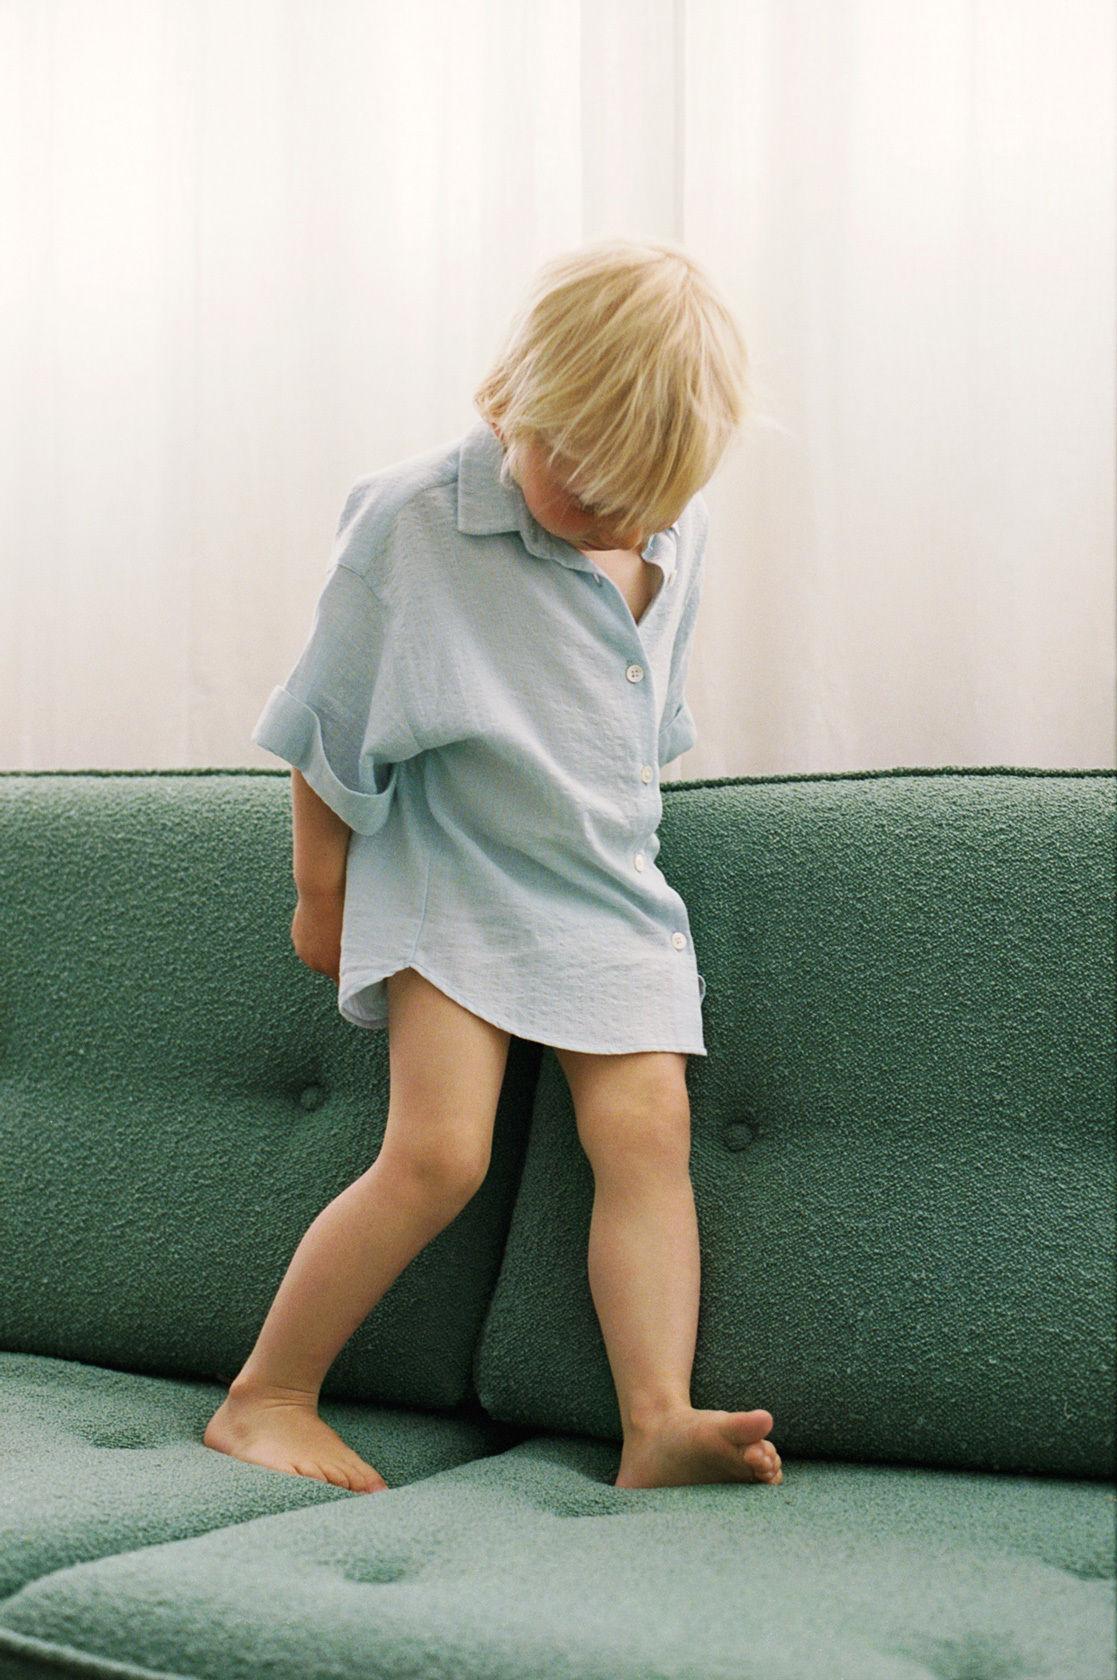 Anouk Nitsche c/o FREDA+WOOLF for Vogue Spain